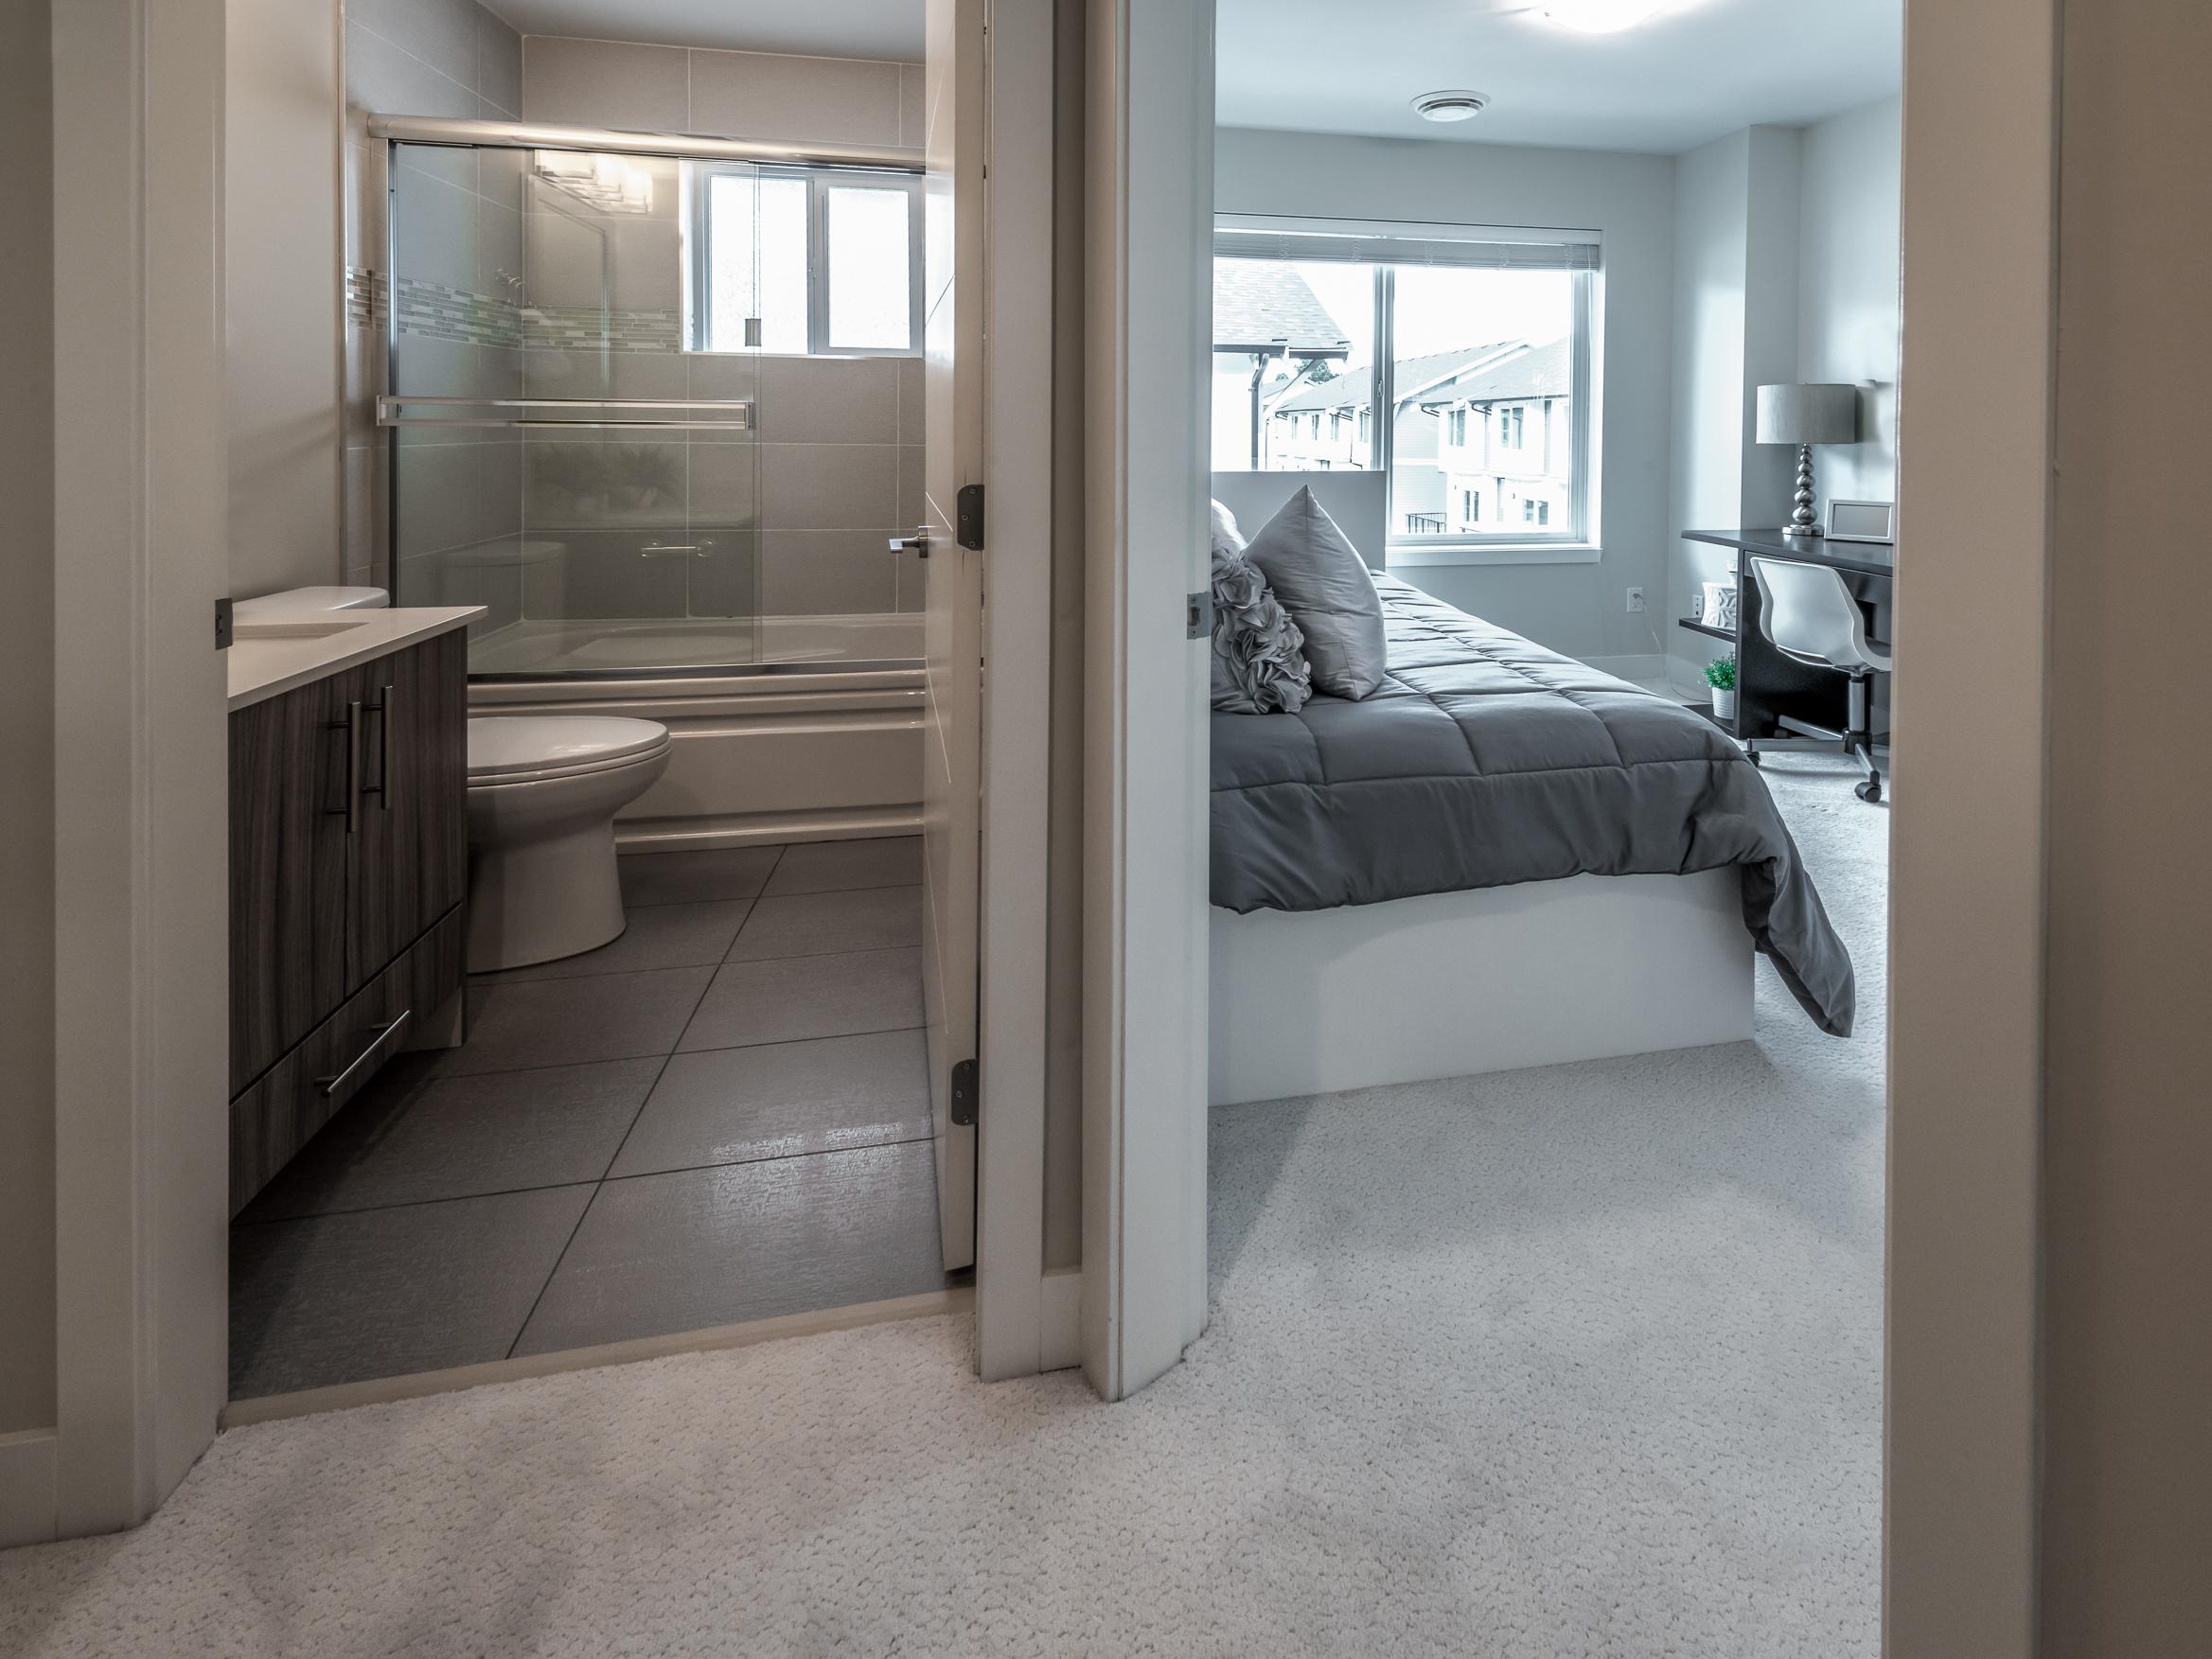 bathroom for university bedroom